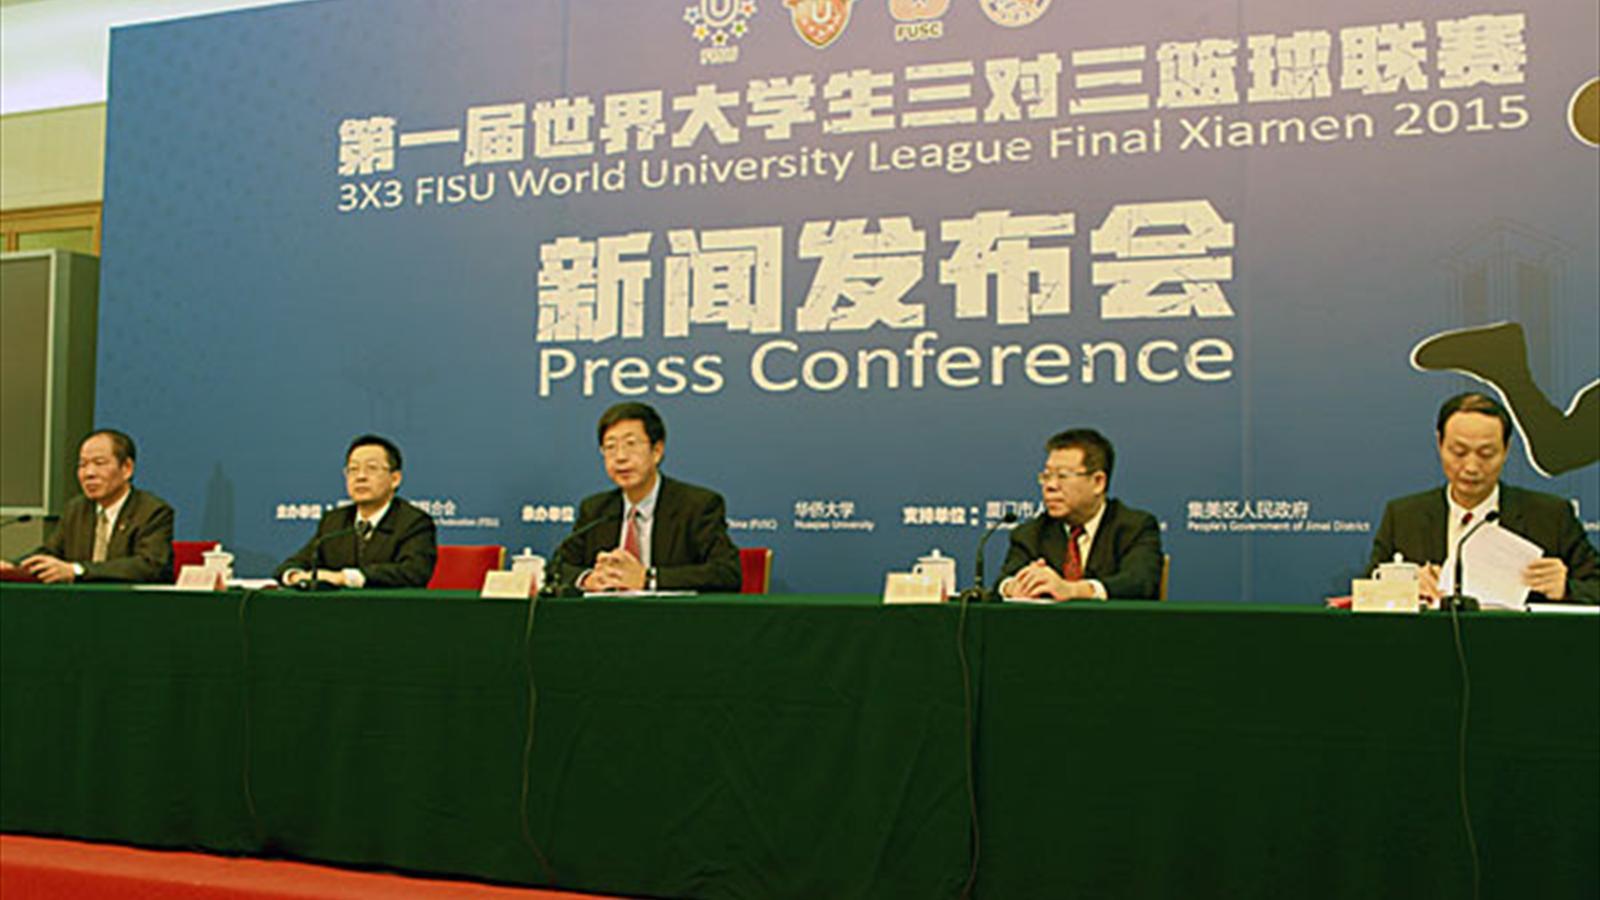 China ready for fisu world university league 3x3 - University league tables french ...